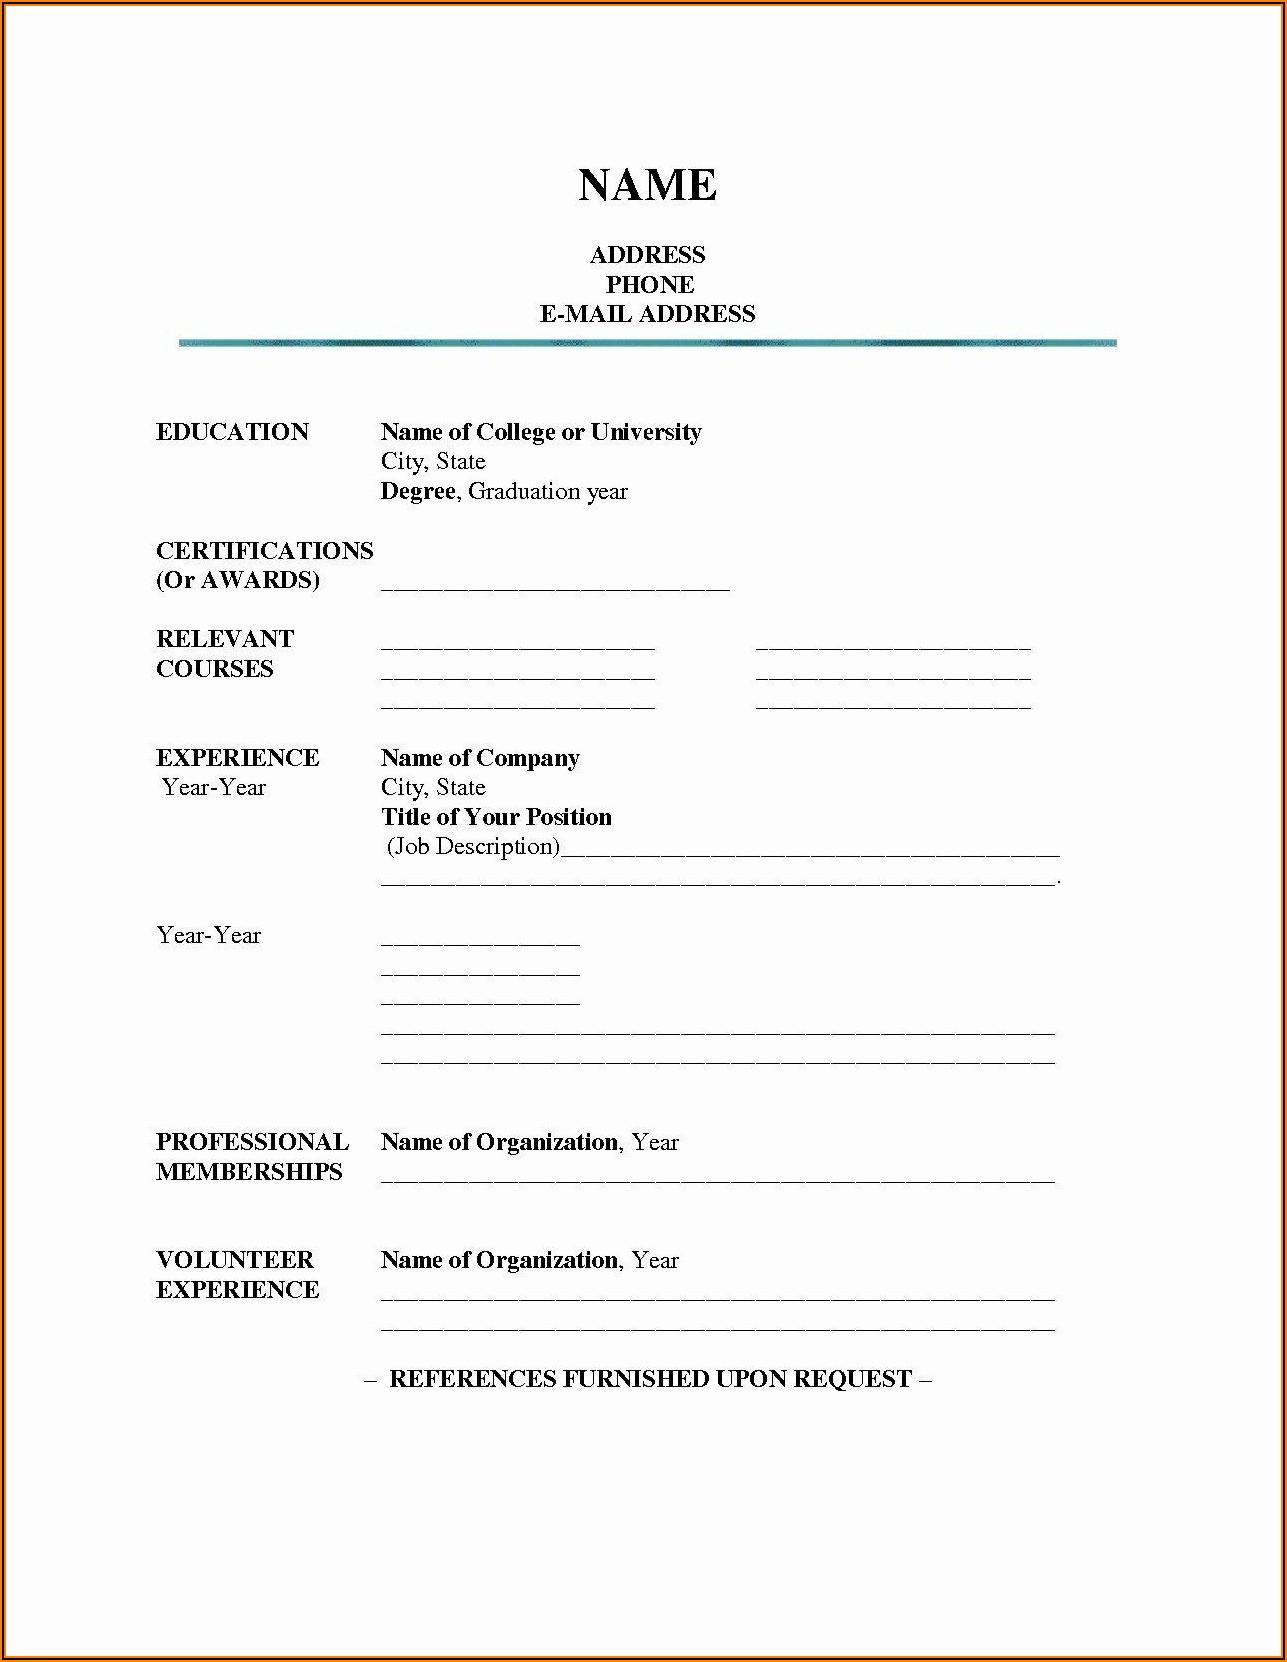 Printable Blank Resume Form For Job Application